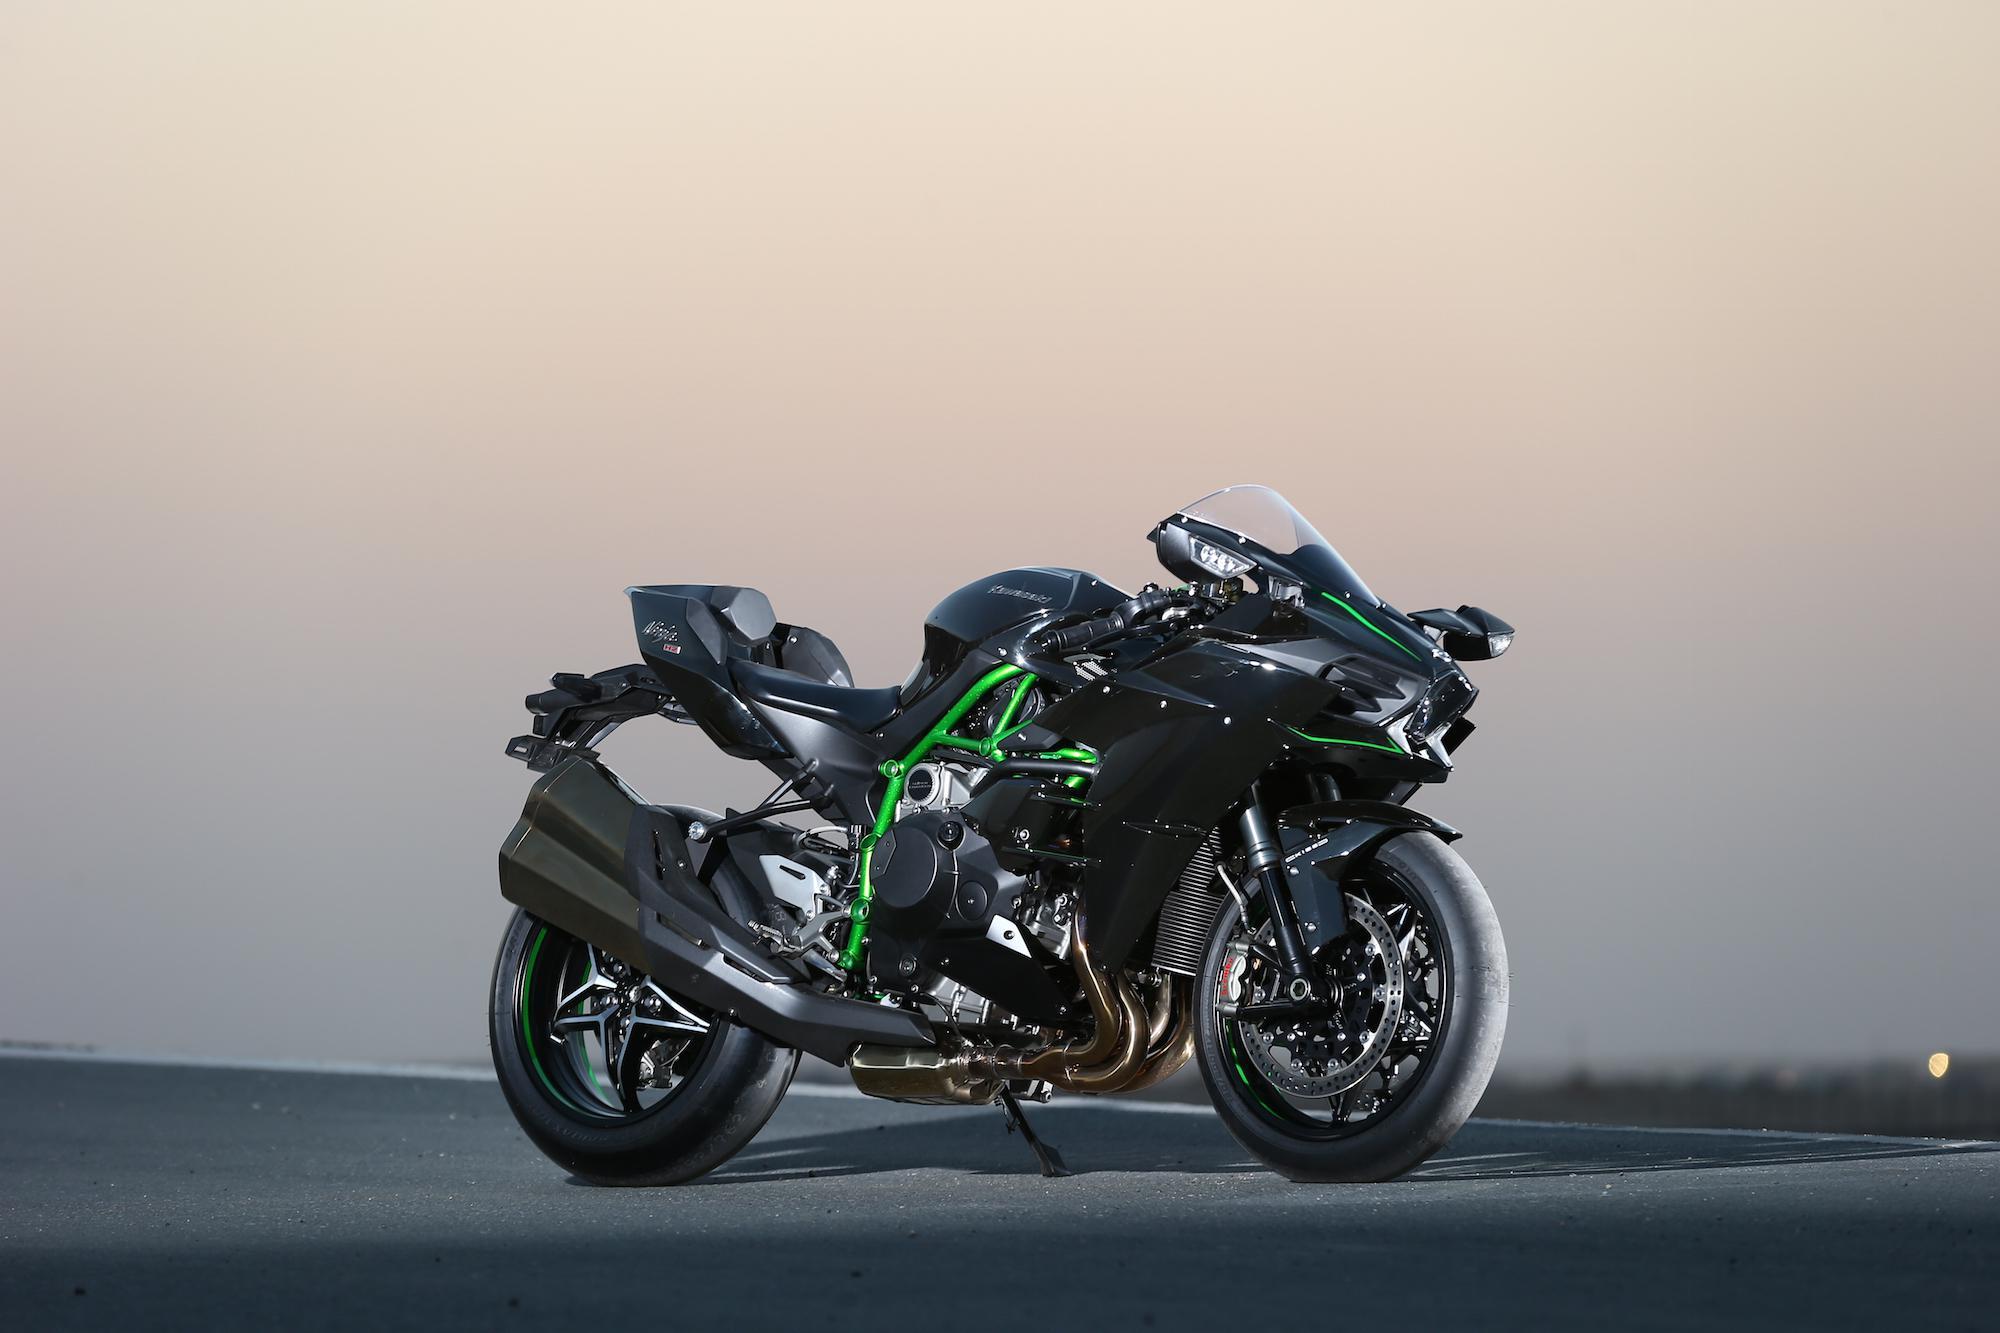 Test Kawasaki Ninja H2 R Mit 326 Ps Auf 320 Kmh Testbericht